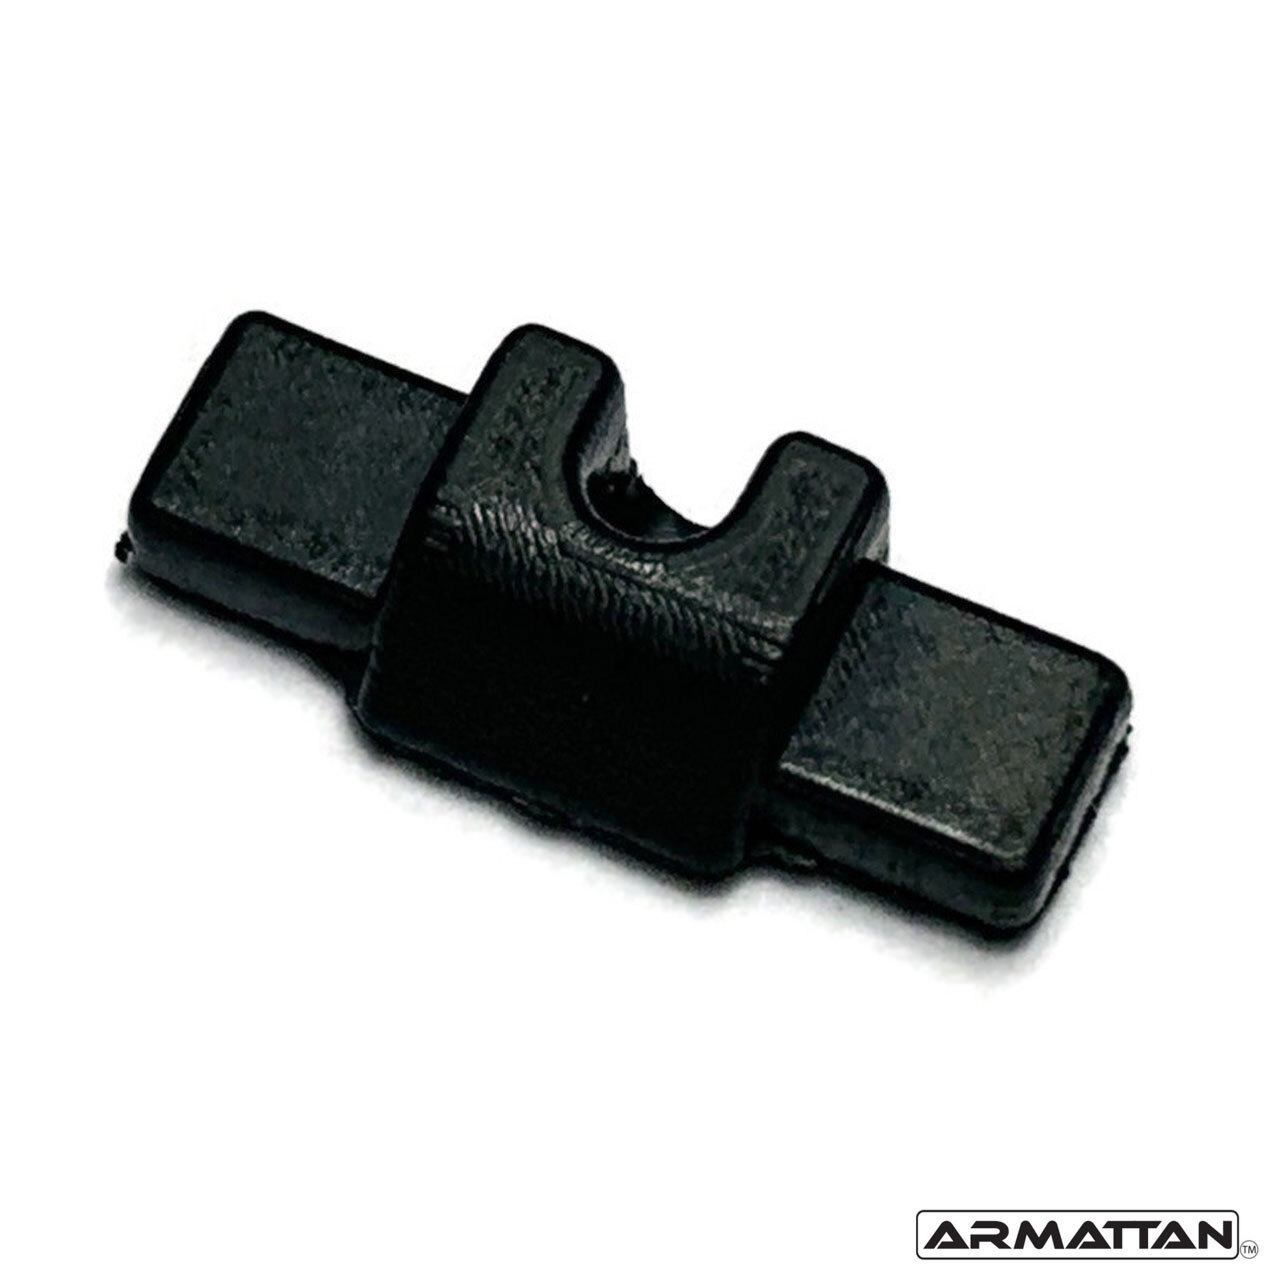 Armattan Tadpole Rubber Antenna Holder